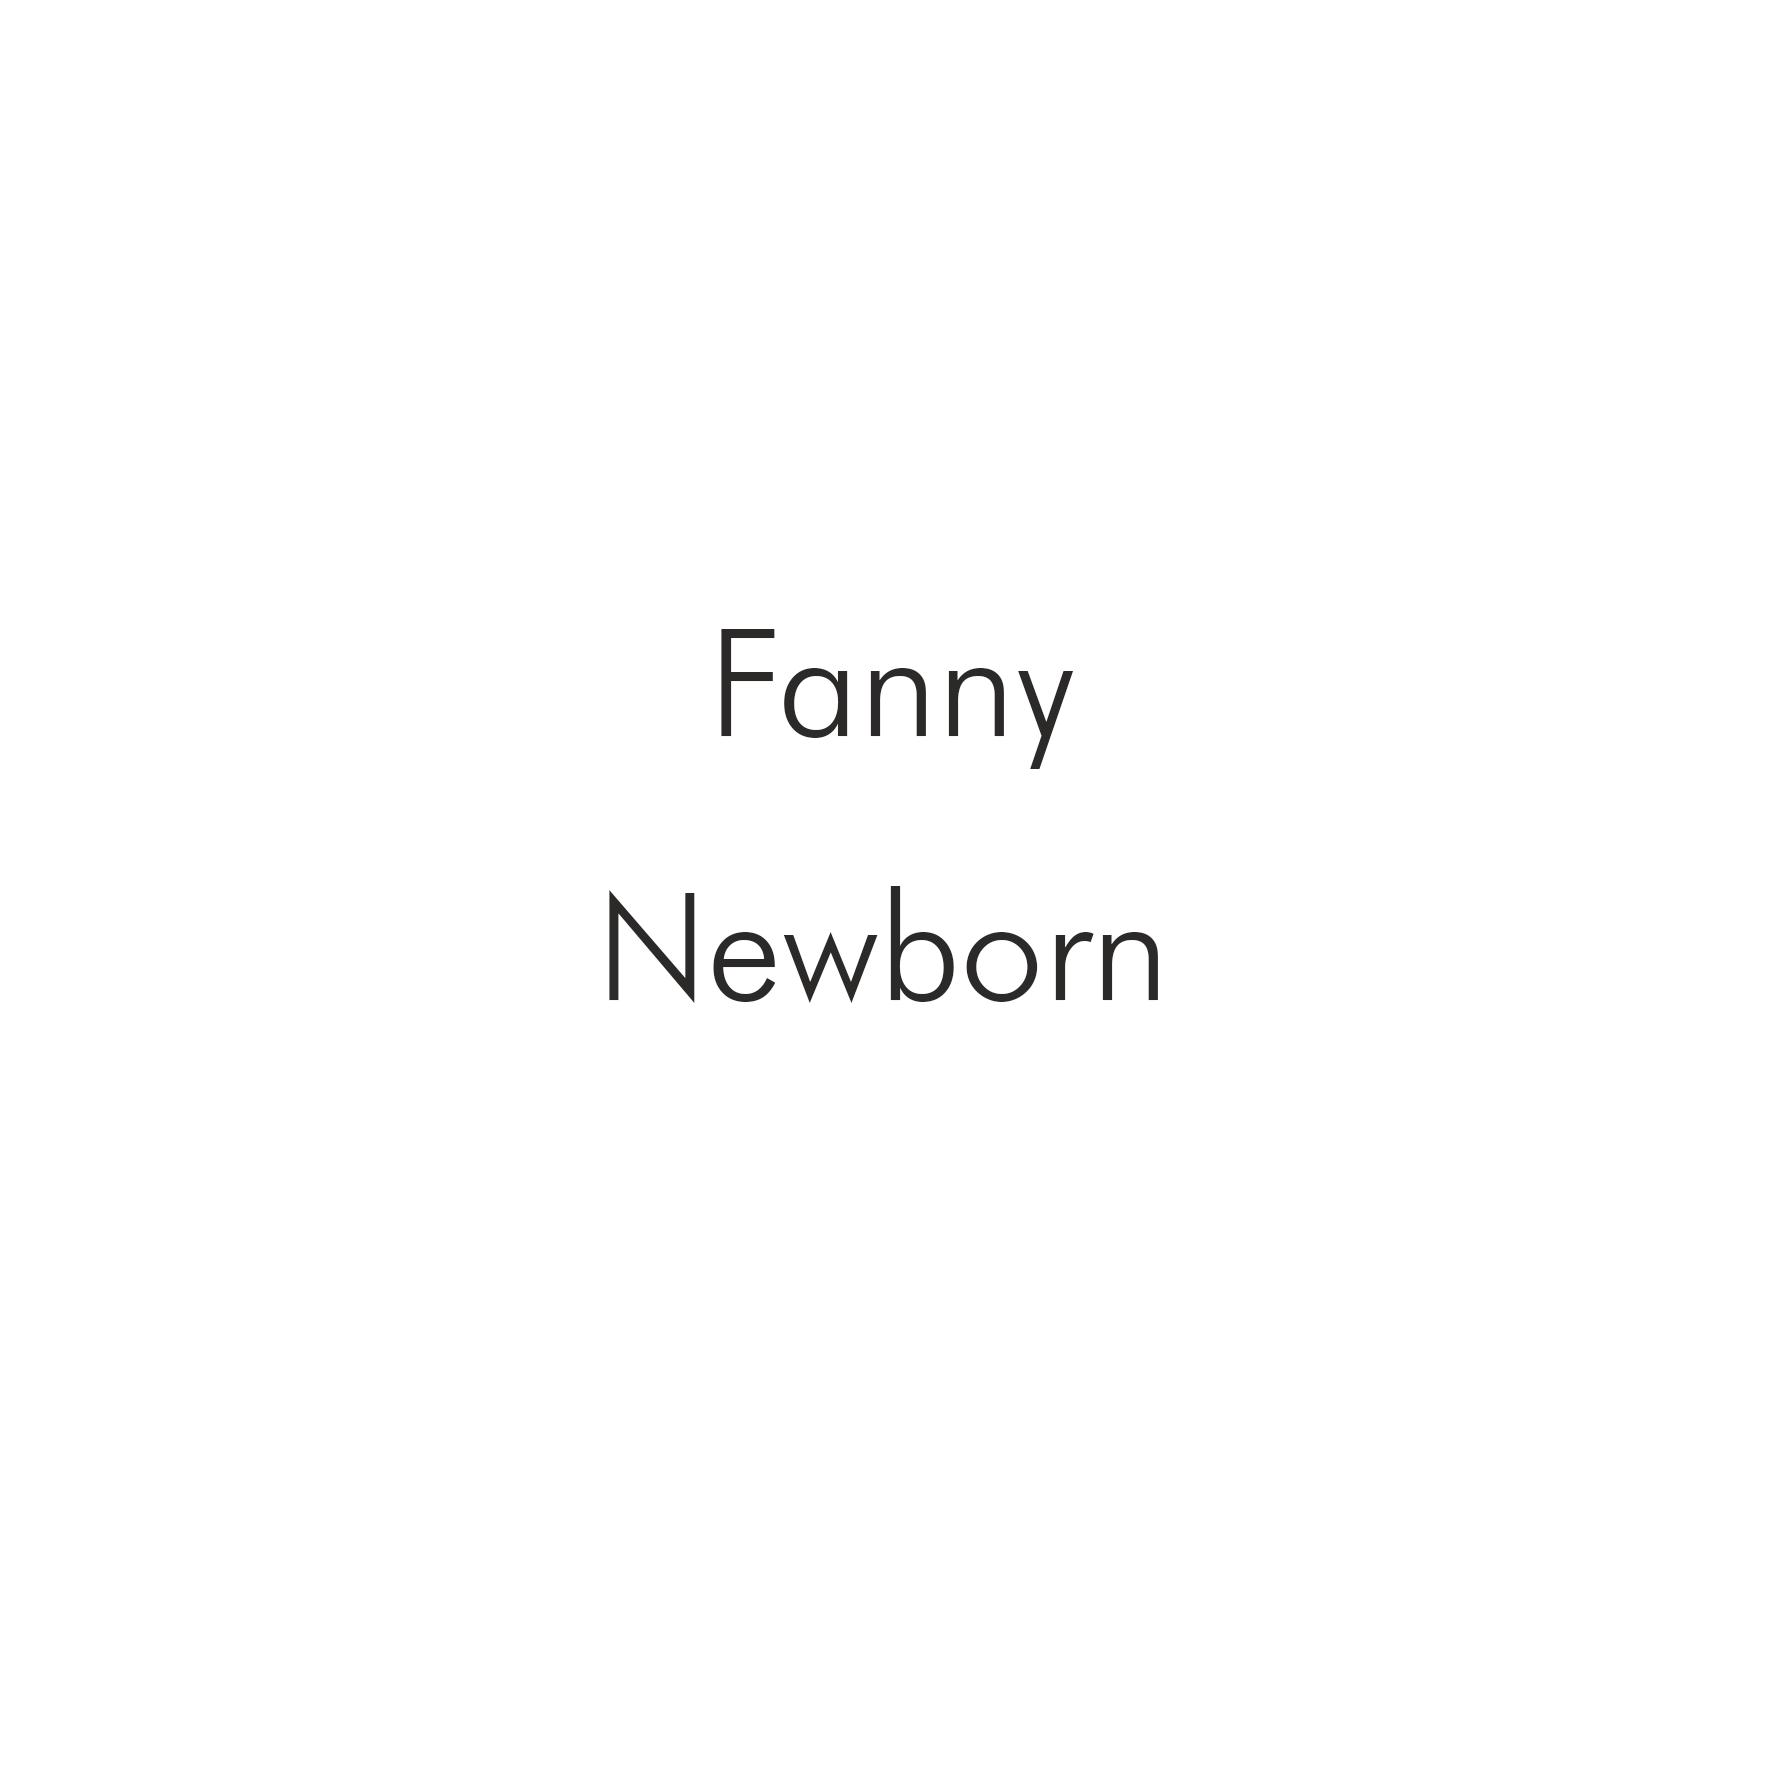 Fanny Newborn.png